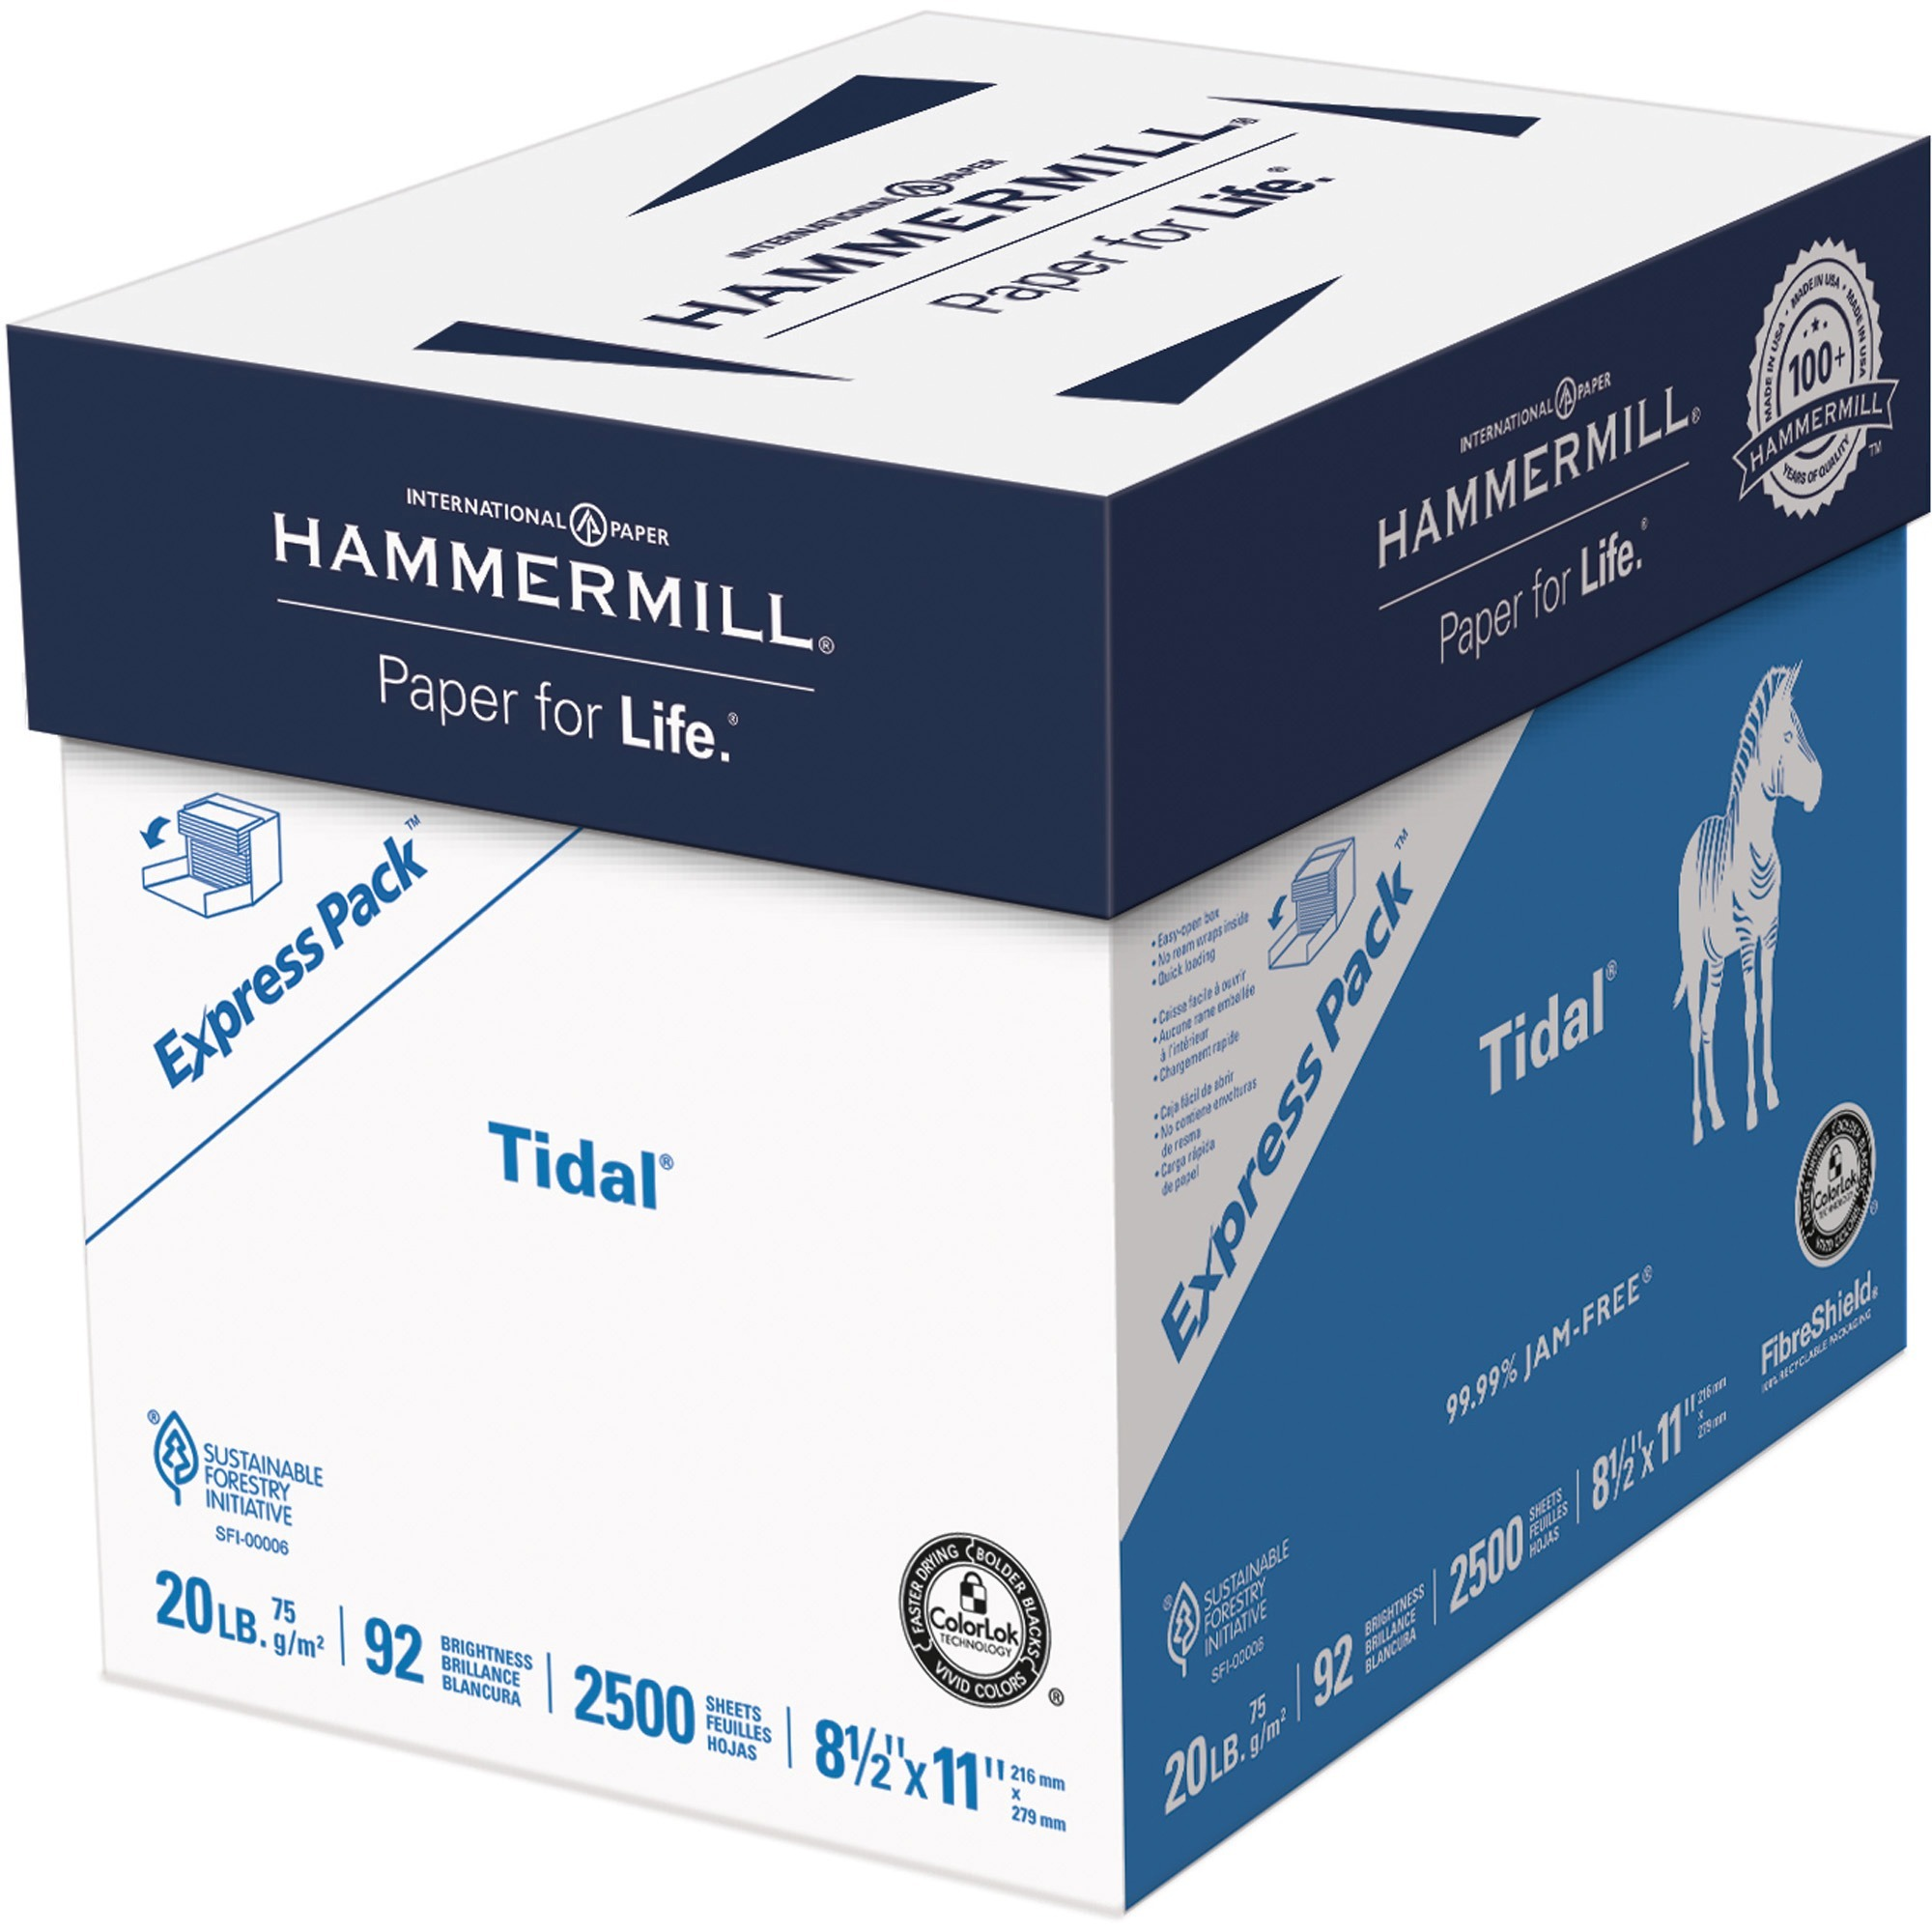 Hammermill, HAM163120, Tidal MP Paper Express Pack, 2500 / Carton, White